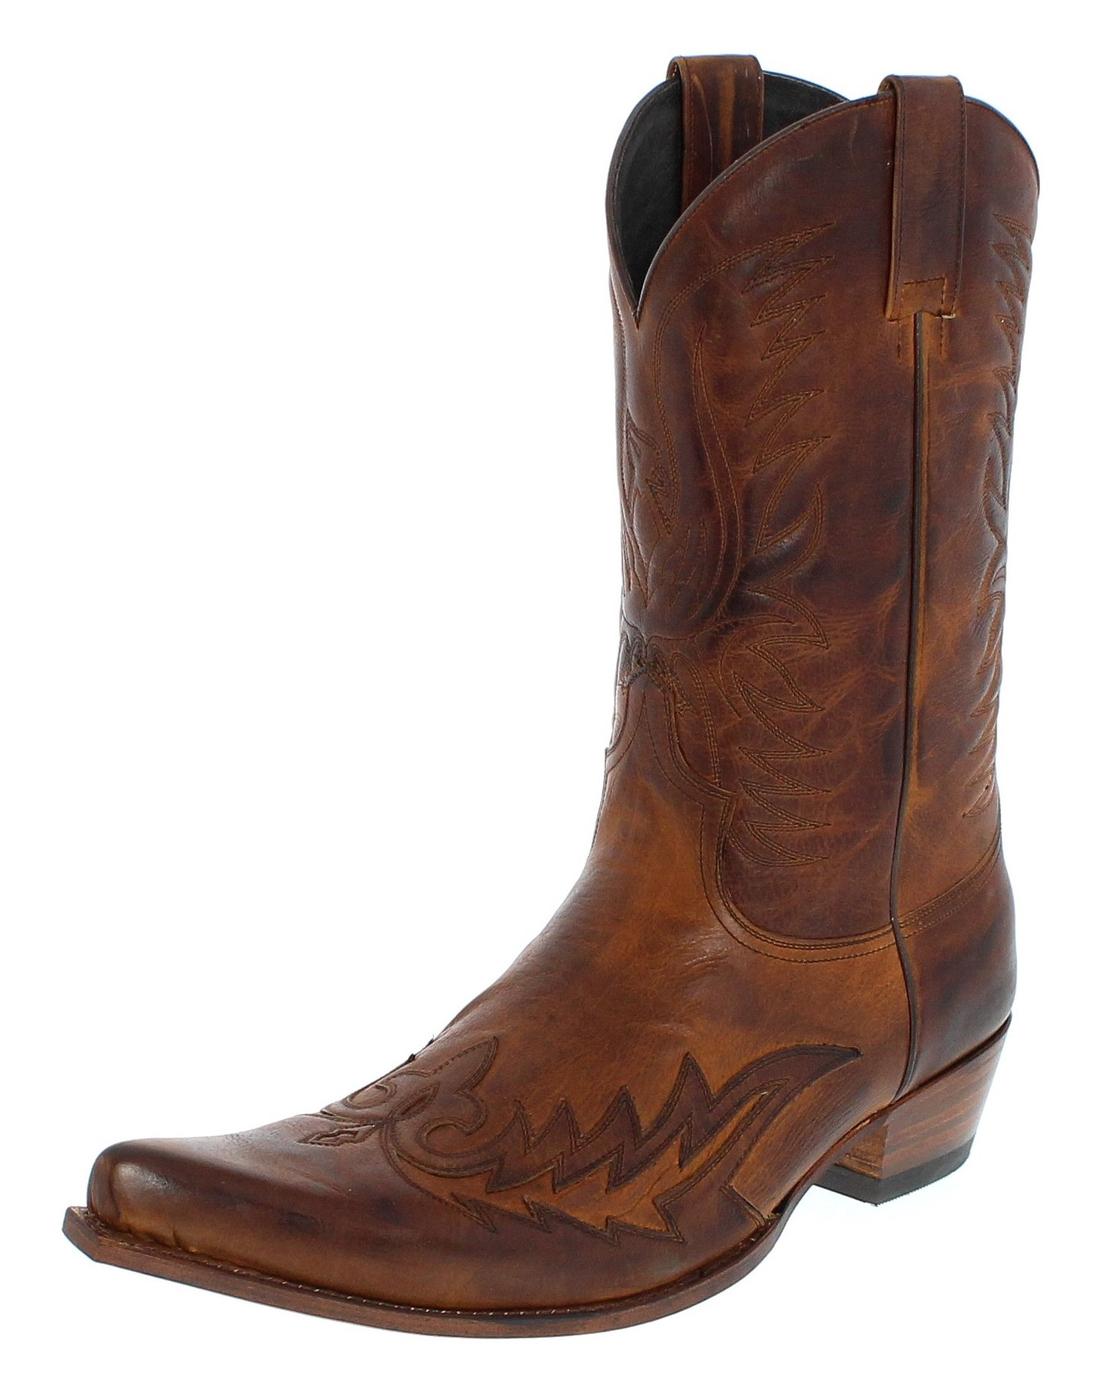 Sendra Boots 12994 Teak Cowboystiefel - braun